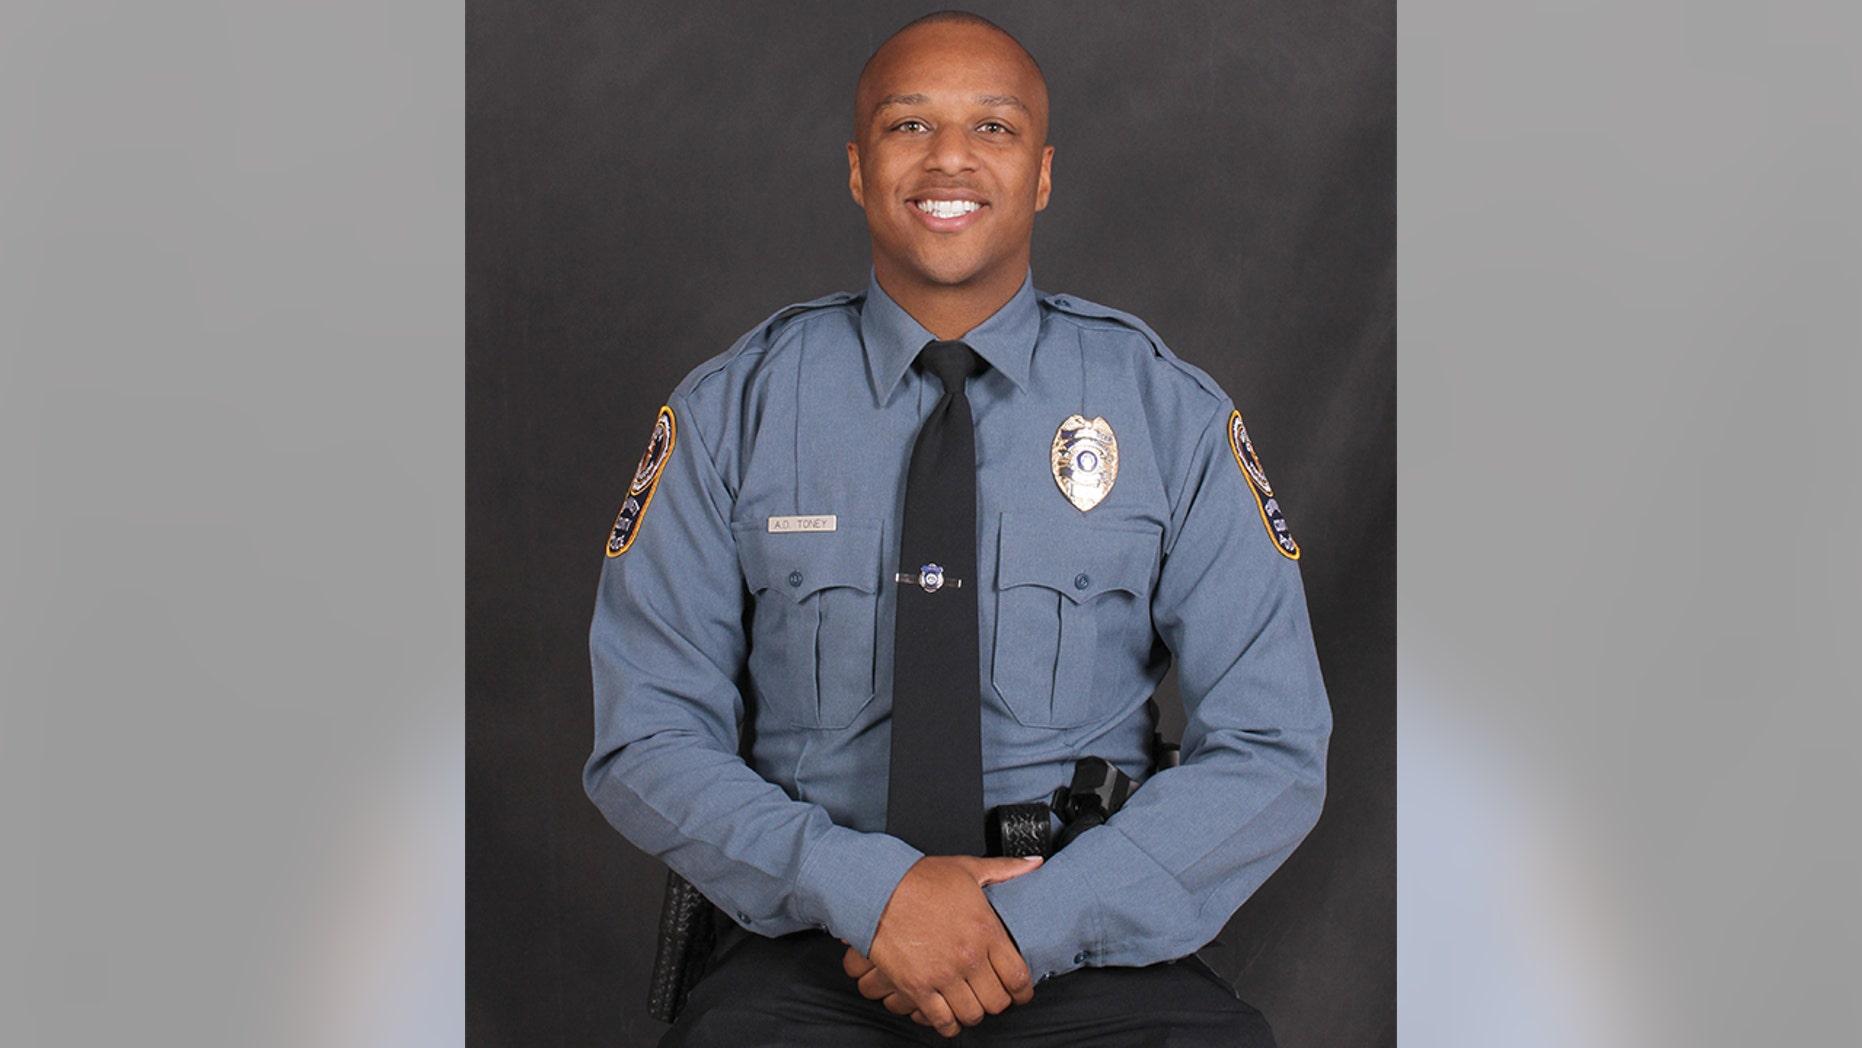 Officer Antwan Toney of the Gwinnett County Police Department.